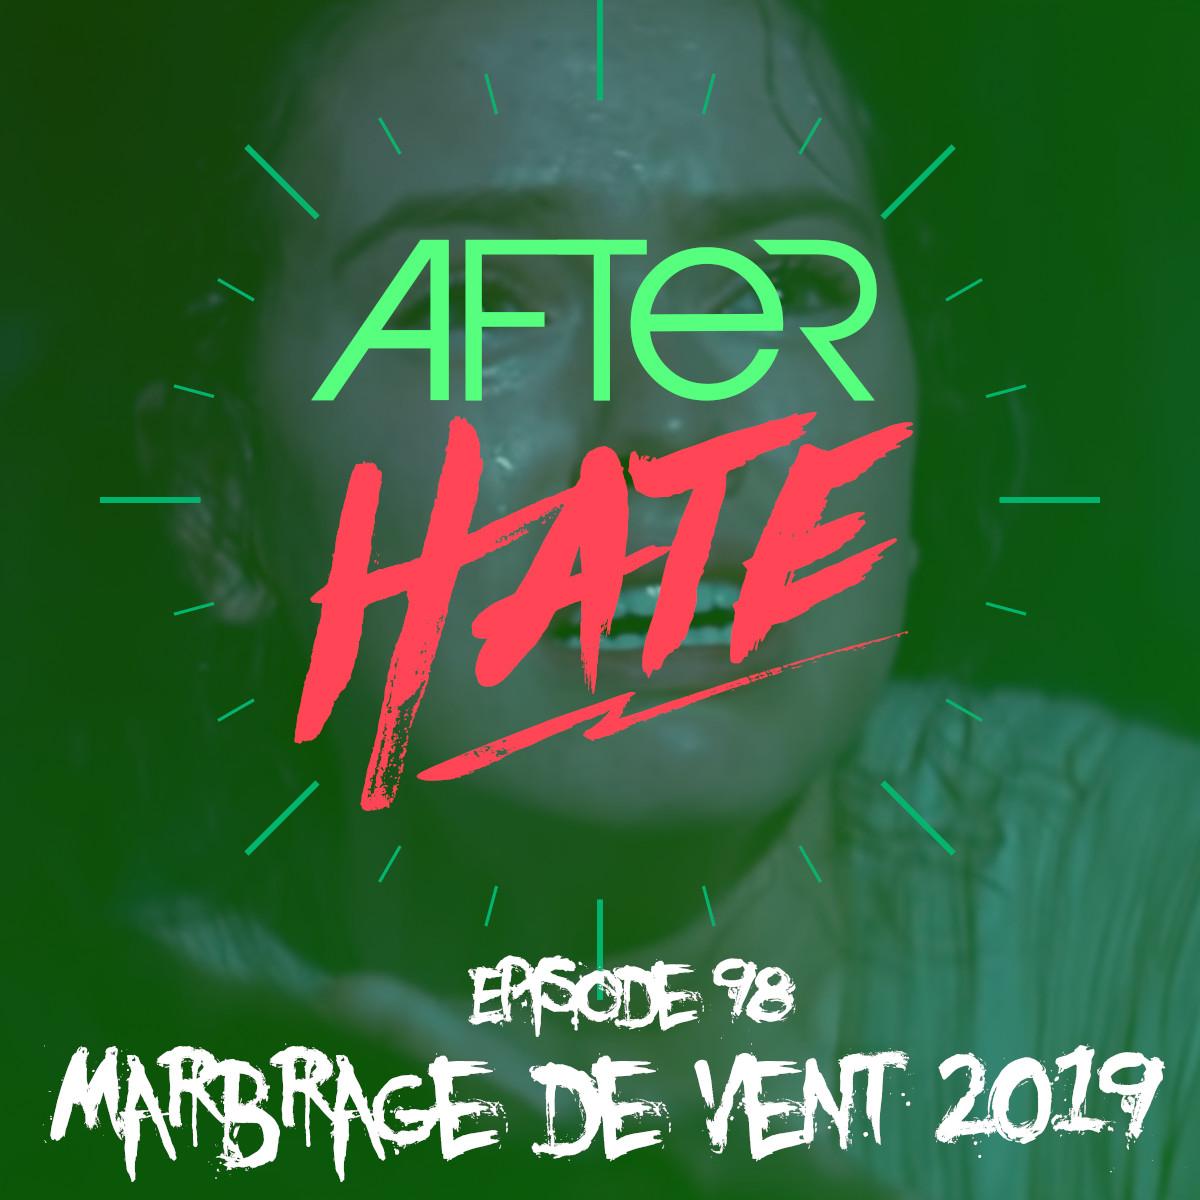 Episode 98 : Marbrage de Vent 2019